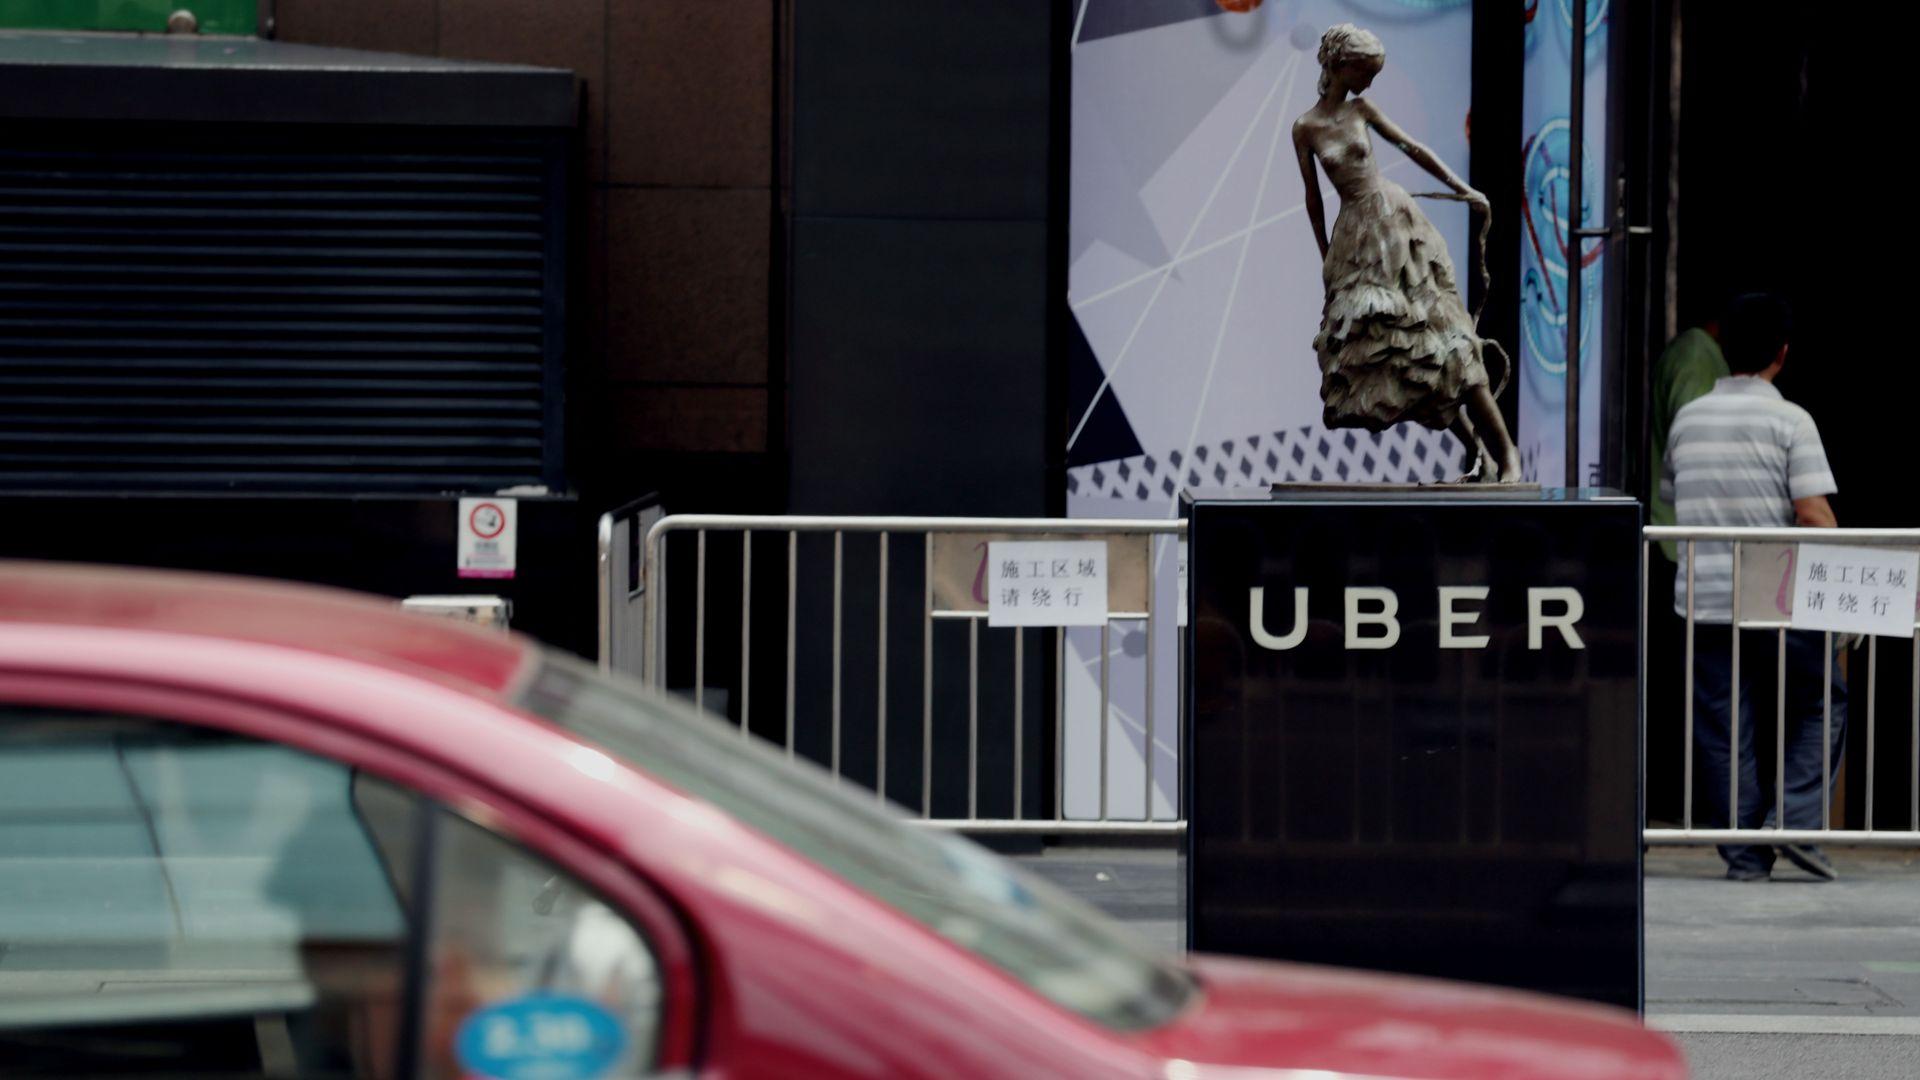 An Uber station